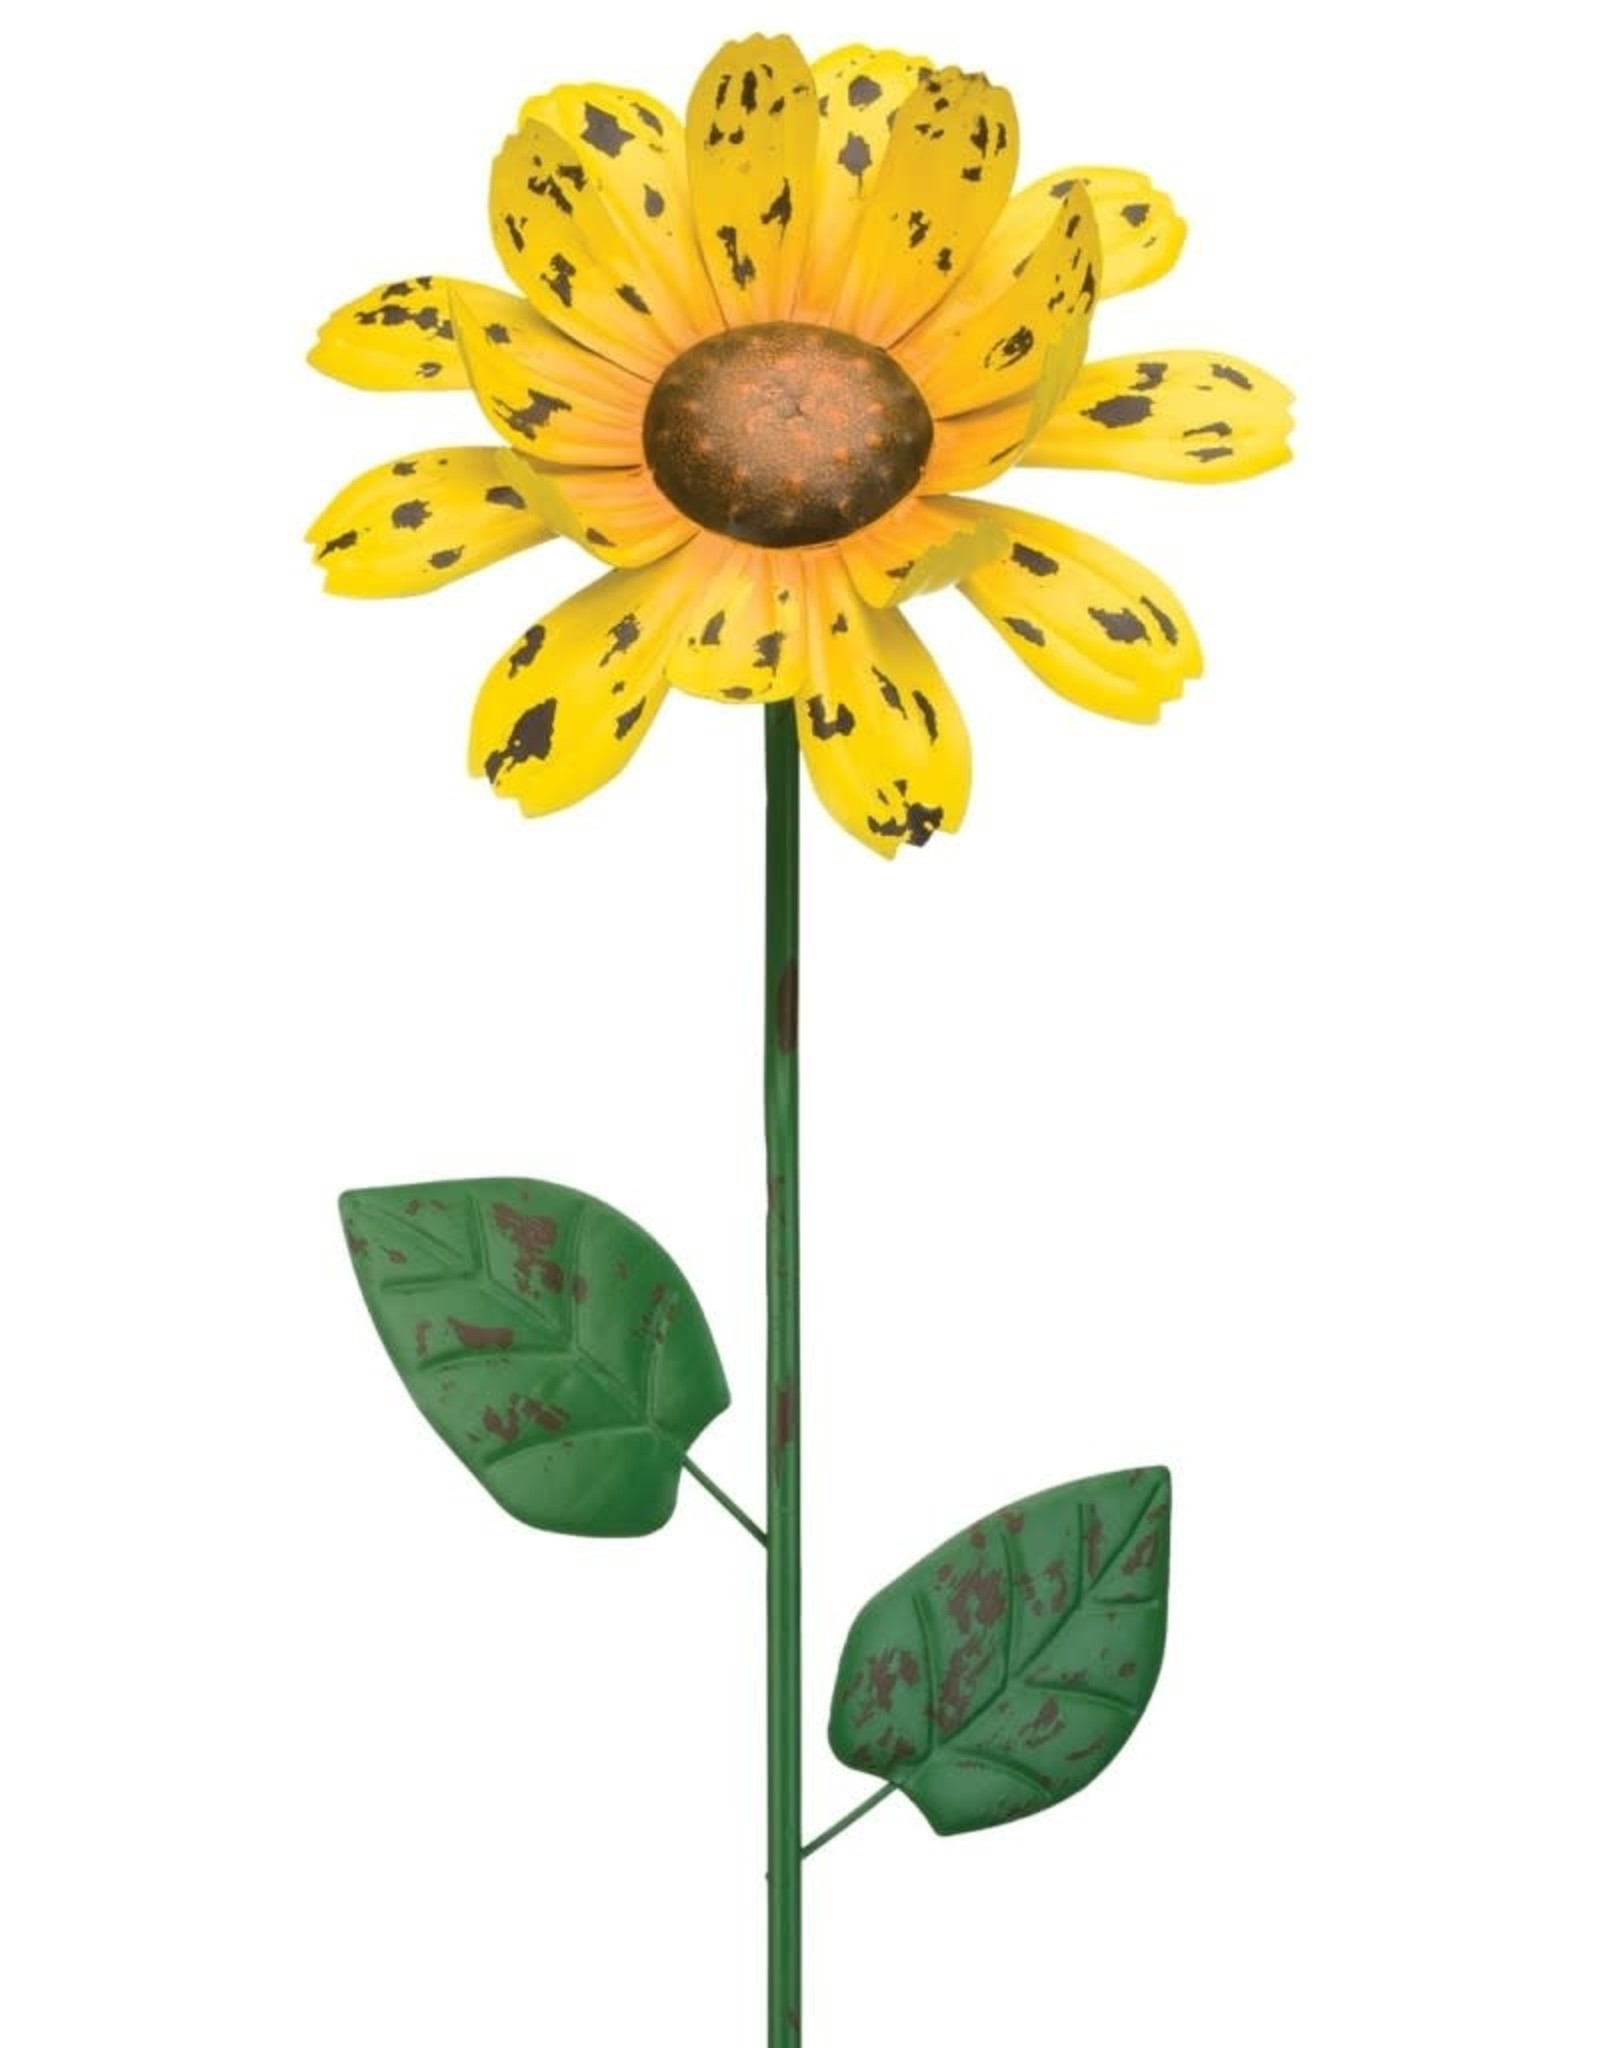 Rustic Flower Stake - Marigold 36''